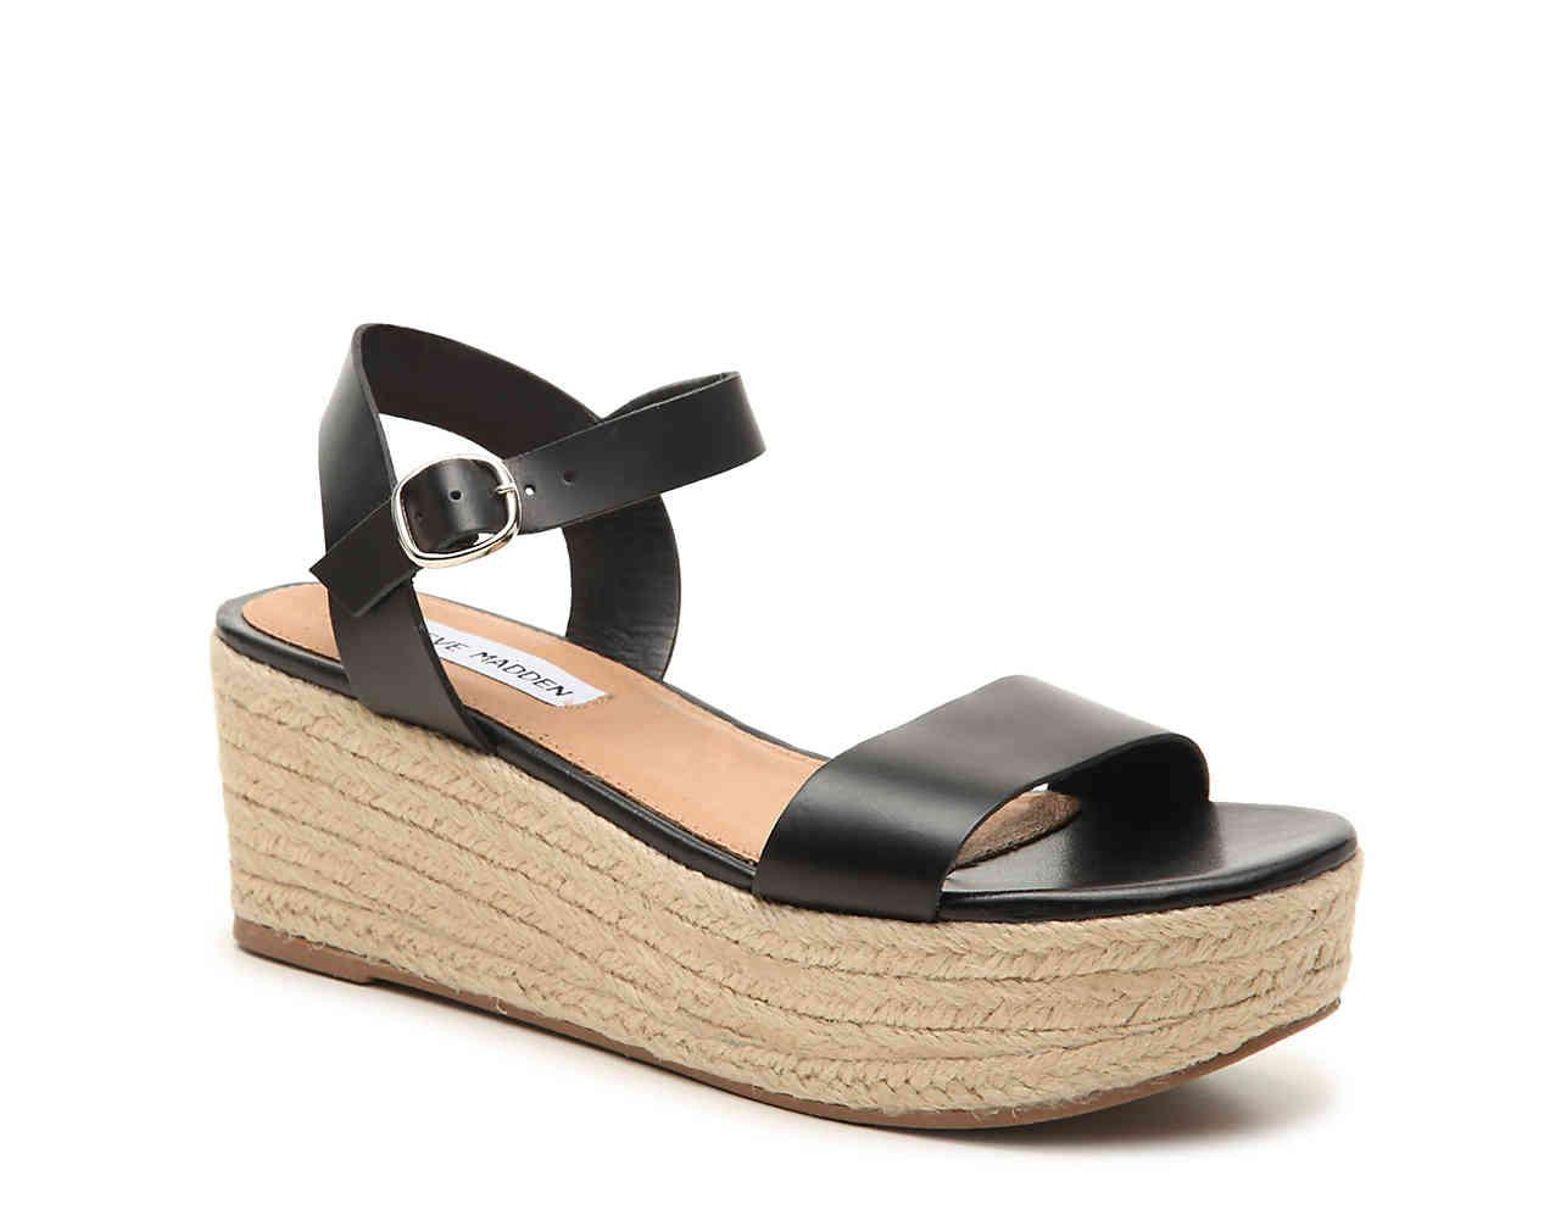 a9d7cb0b0df Women's Black Brandice Espadrille Wedge Sandal